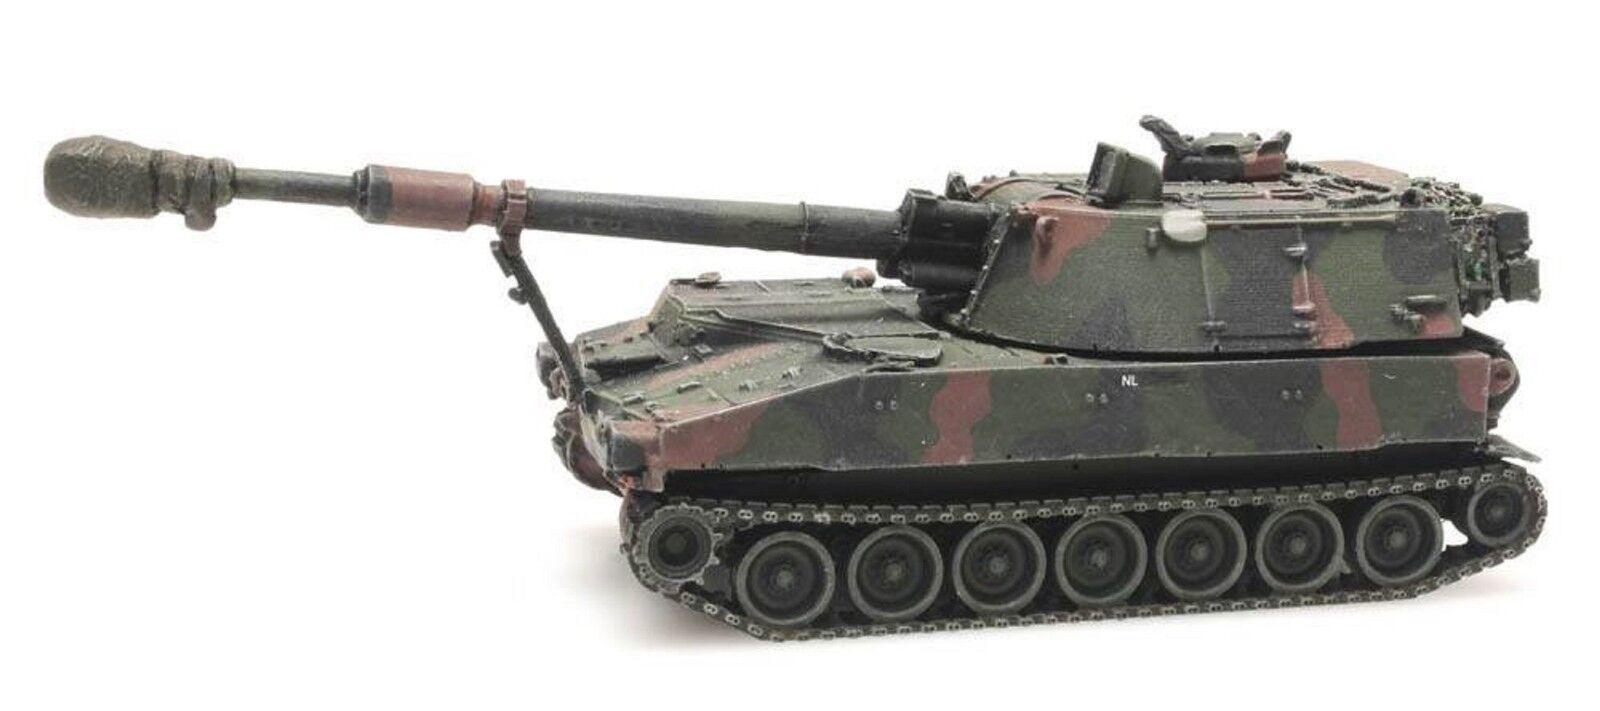 Artitec 6870149 NL M109 A2 Camo Eisenbahntransport H0 1 87 Fertigmodell Panzer    Lebendige Form